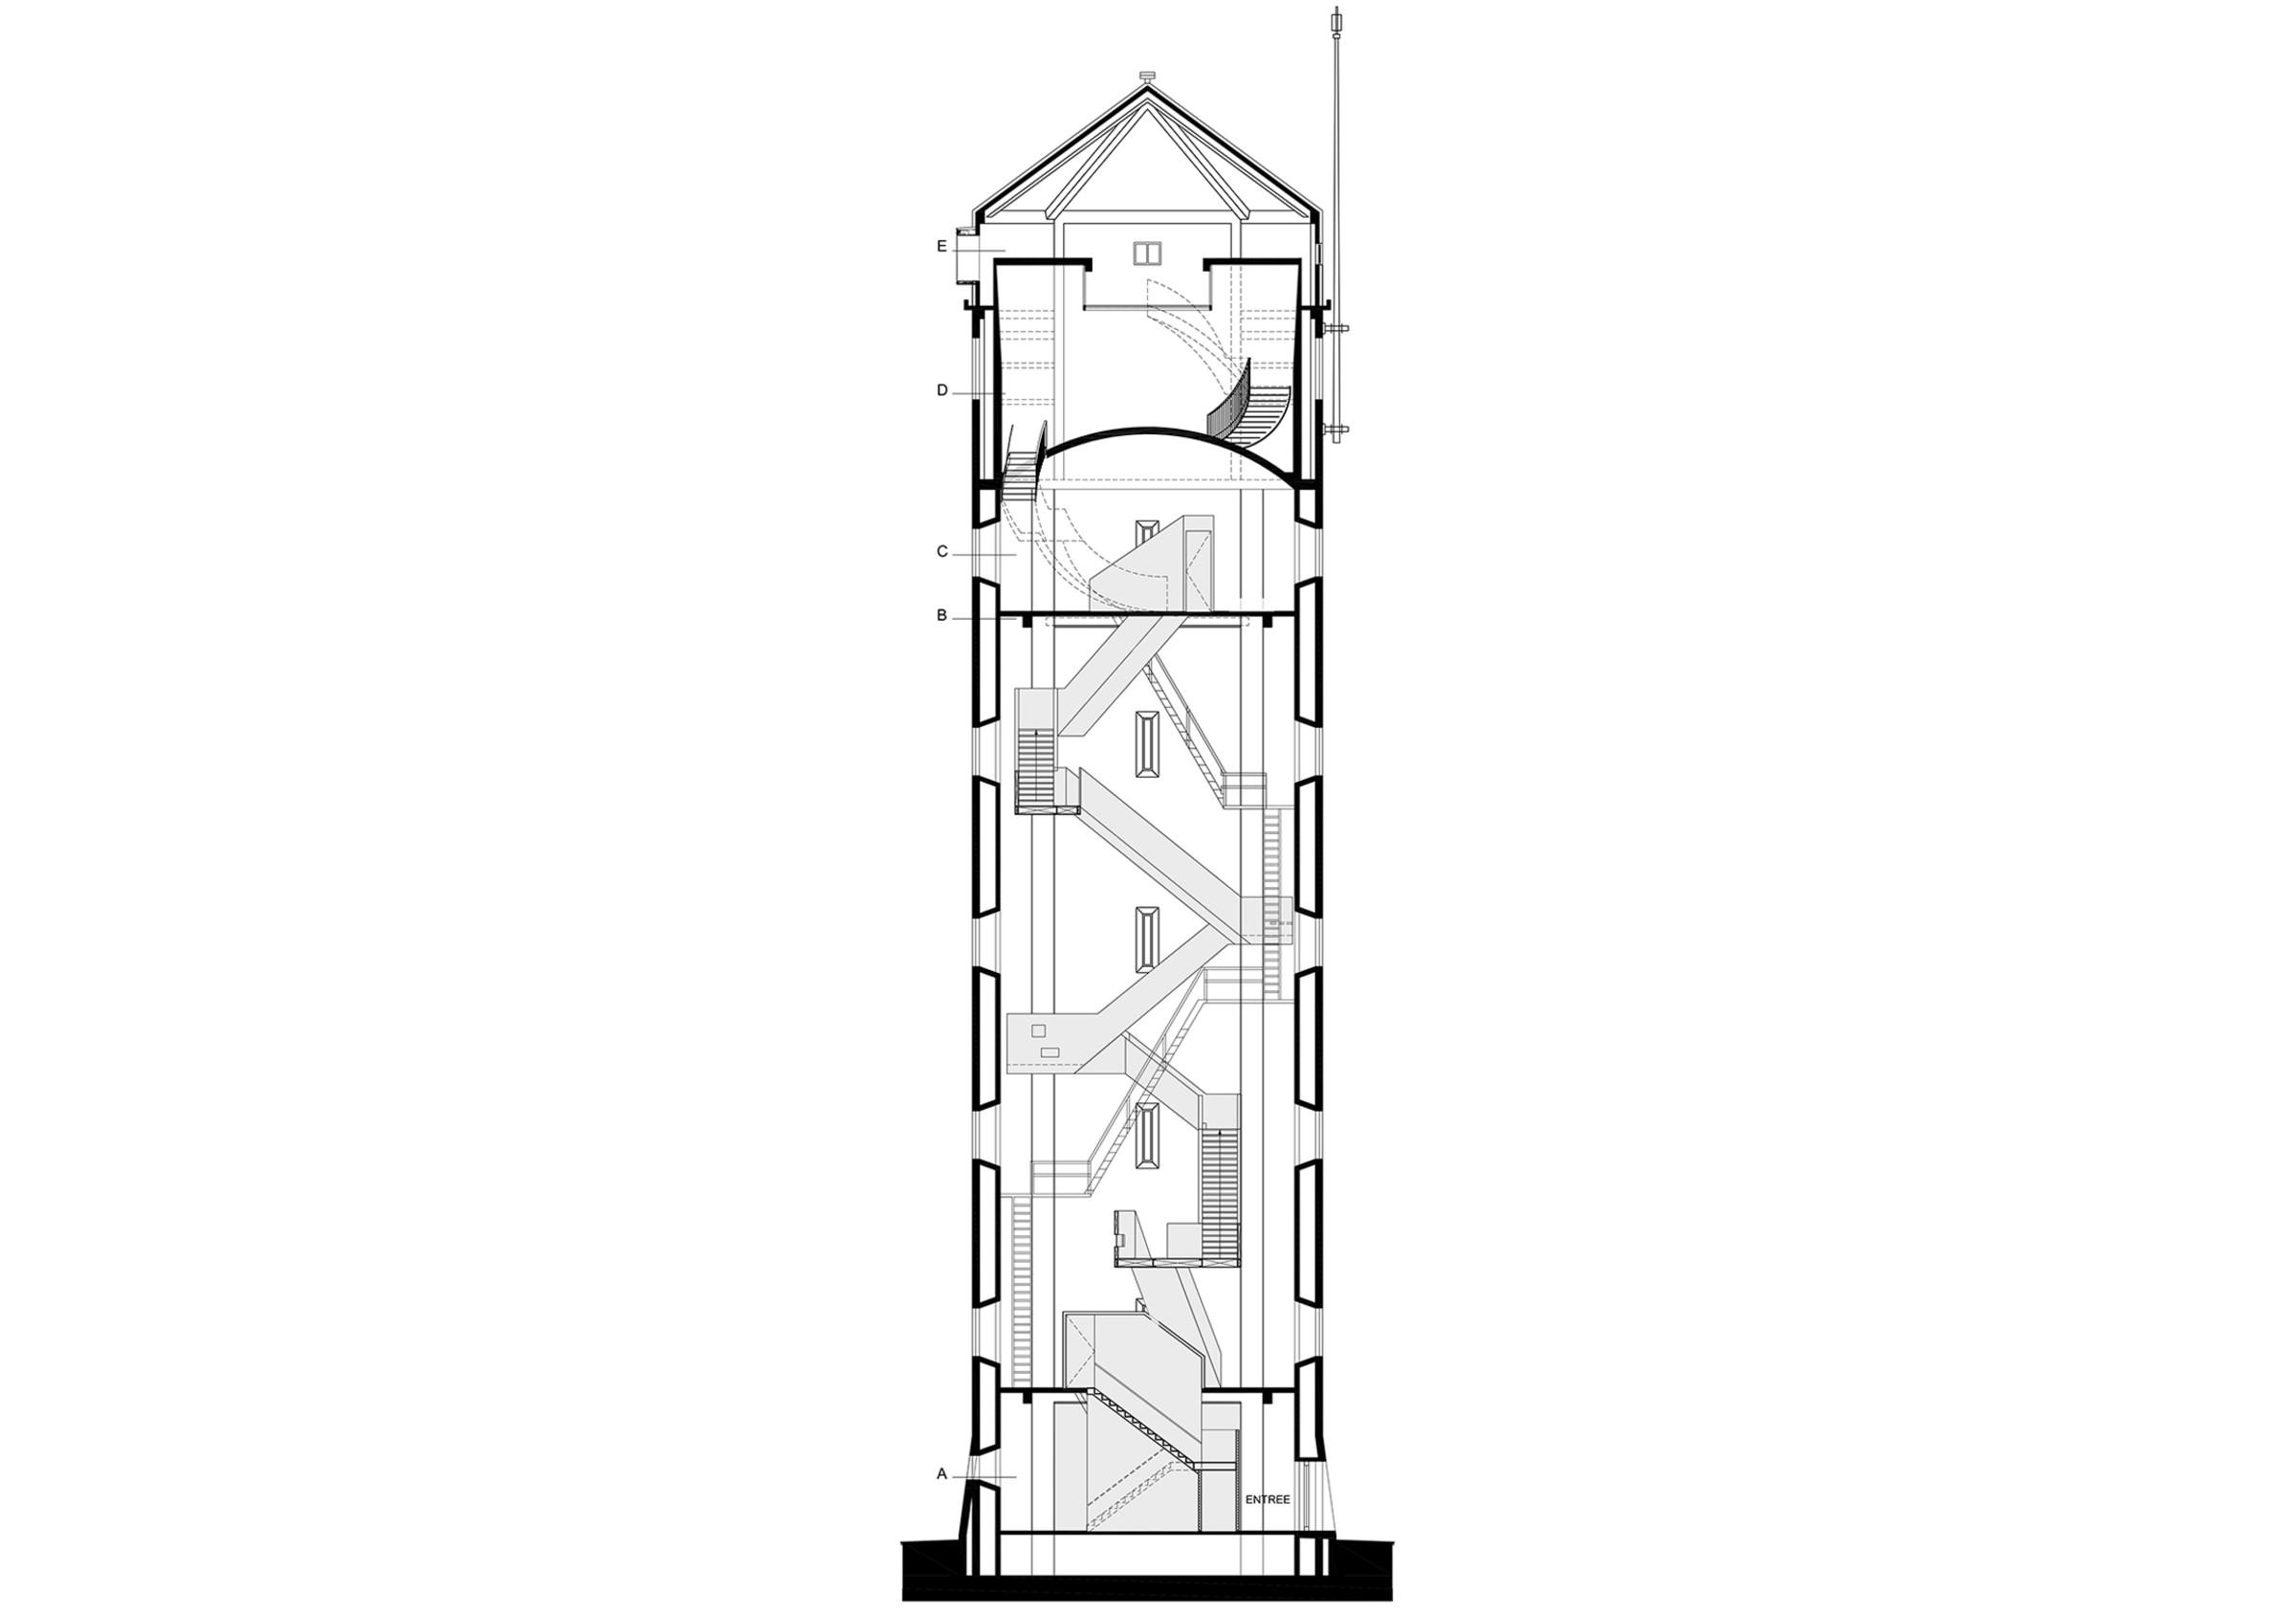 Water Tower Sint Jansklooster Zecc Architecten